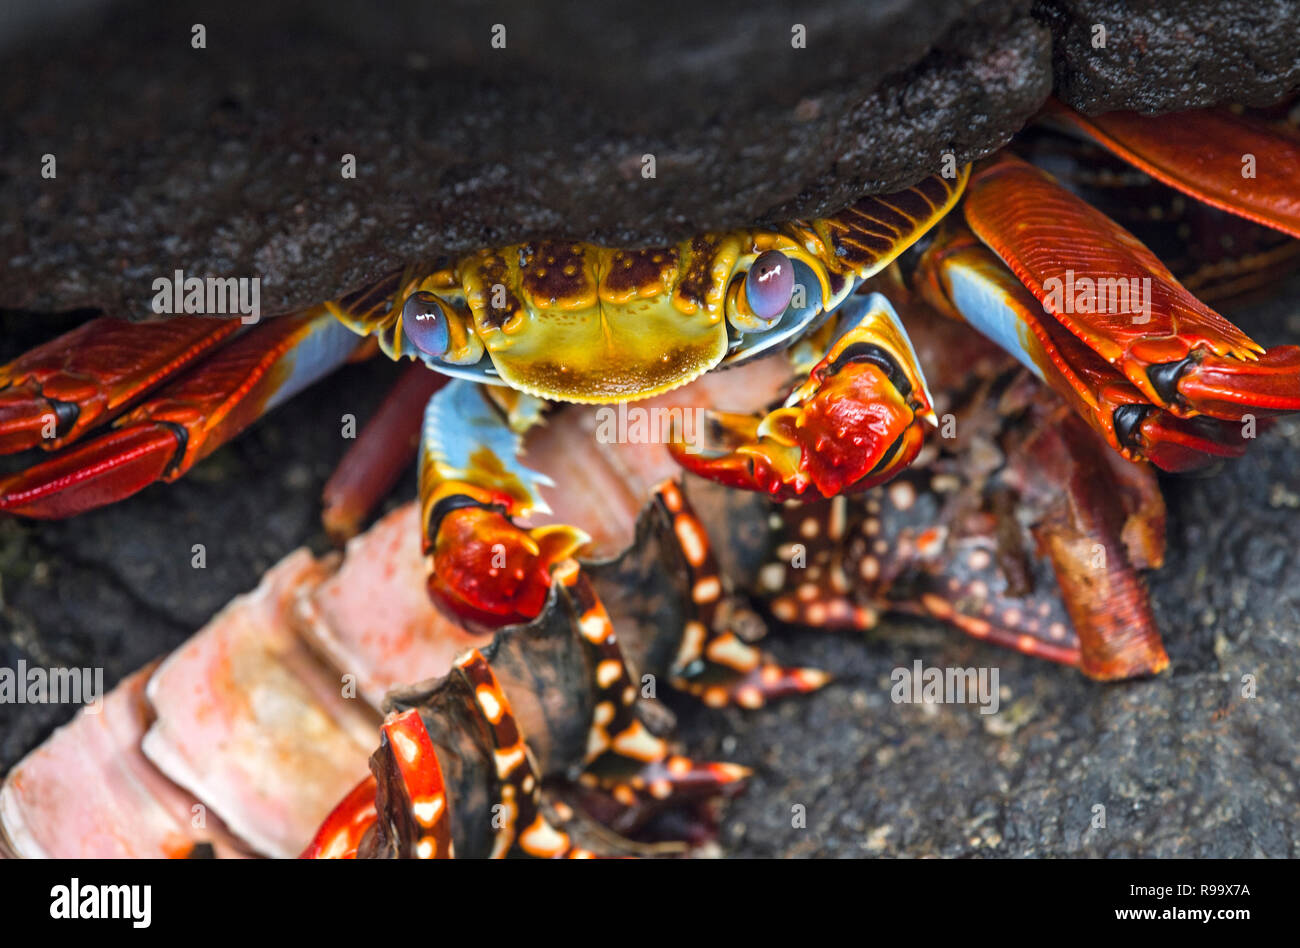 Sally Lightfoot Crab (Grapsus grapsus) hiding uncder a stone, Marsh crabs family (Grapsidae), Floreana  Island, Galapagos Islands, Ecuador - Stock Image